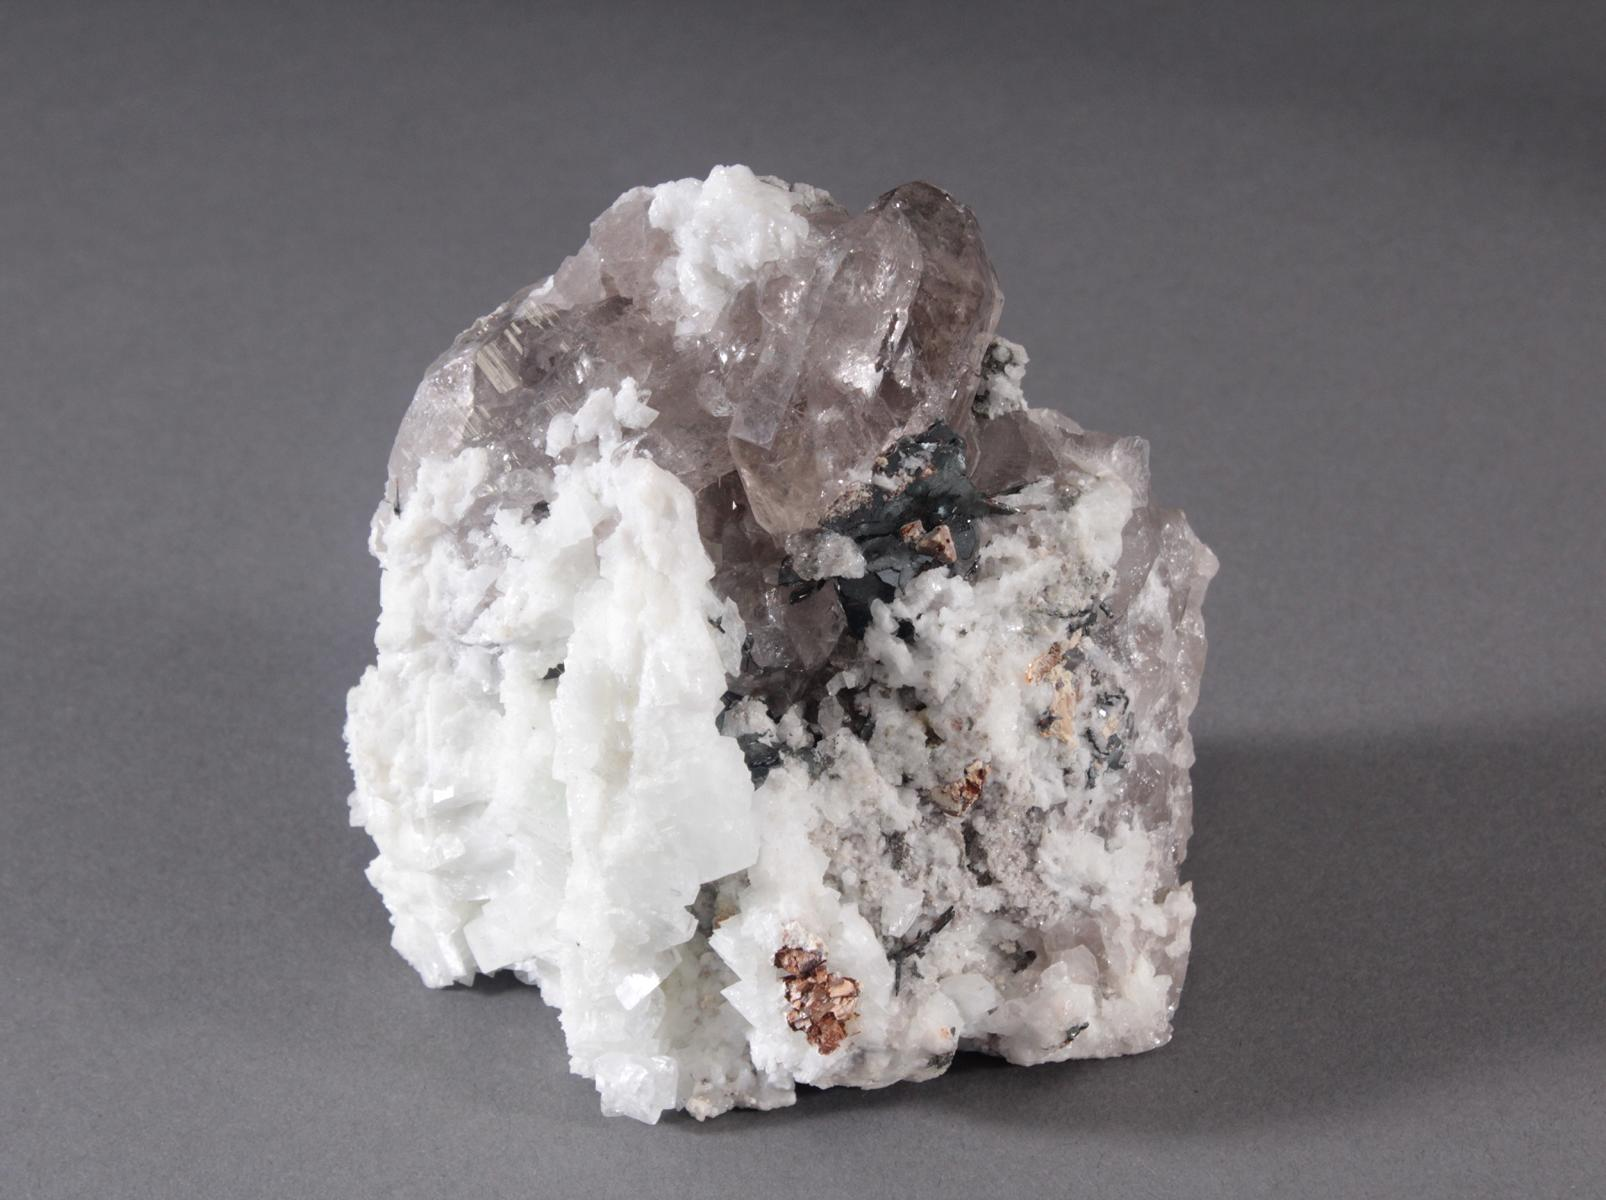 Rauchquarz-Faden-Ketten-Adular-Hämatit-Rutil-Siderit